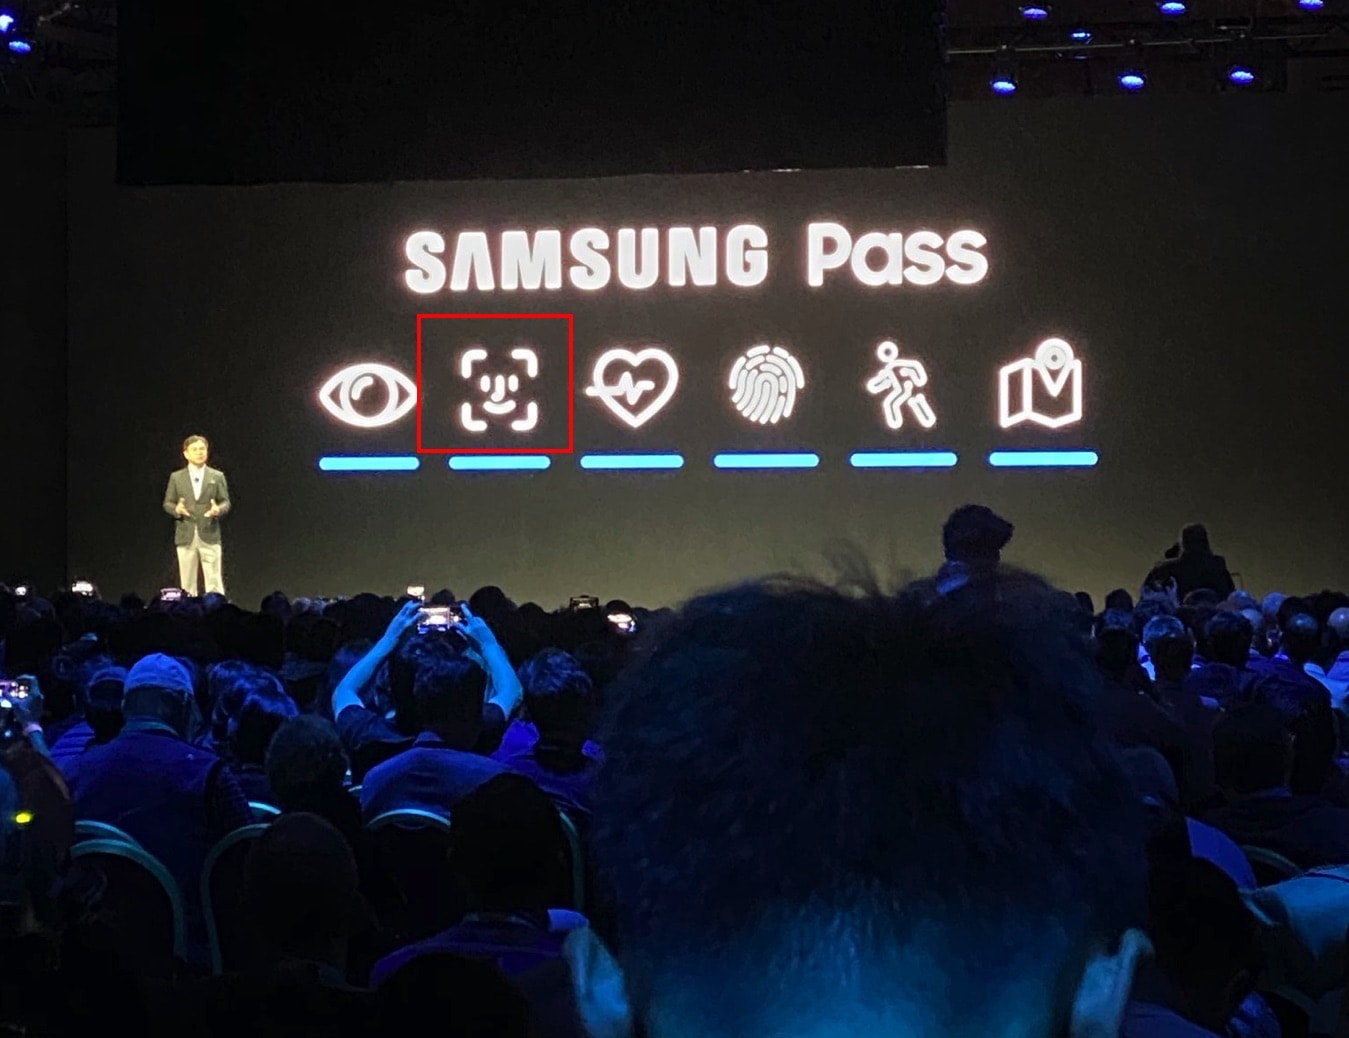 Samsung Pass logo